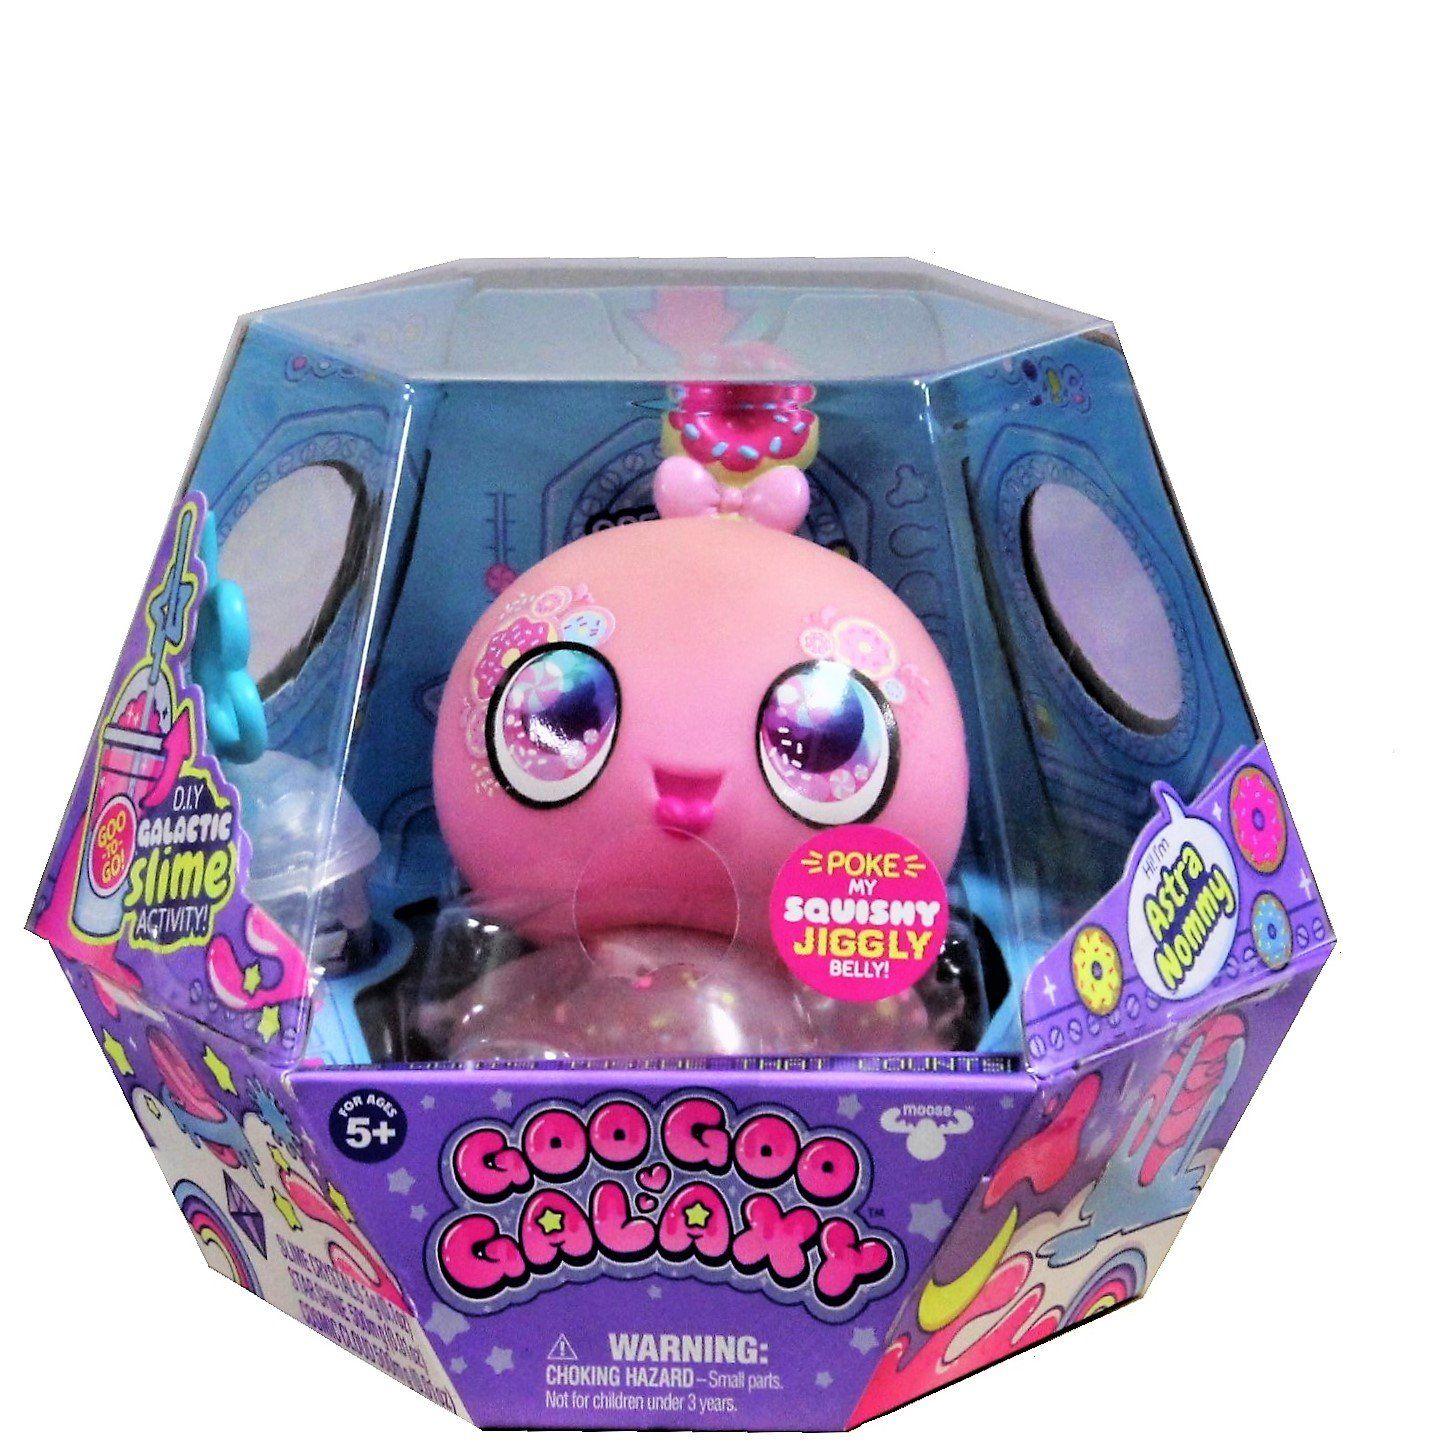 Goo Goo Galaxy Baby Single Pack